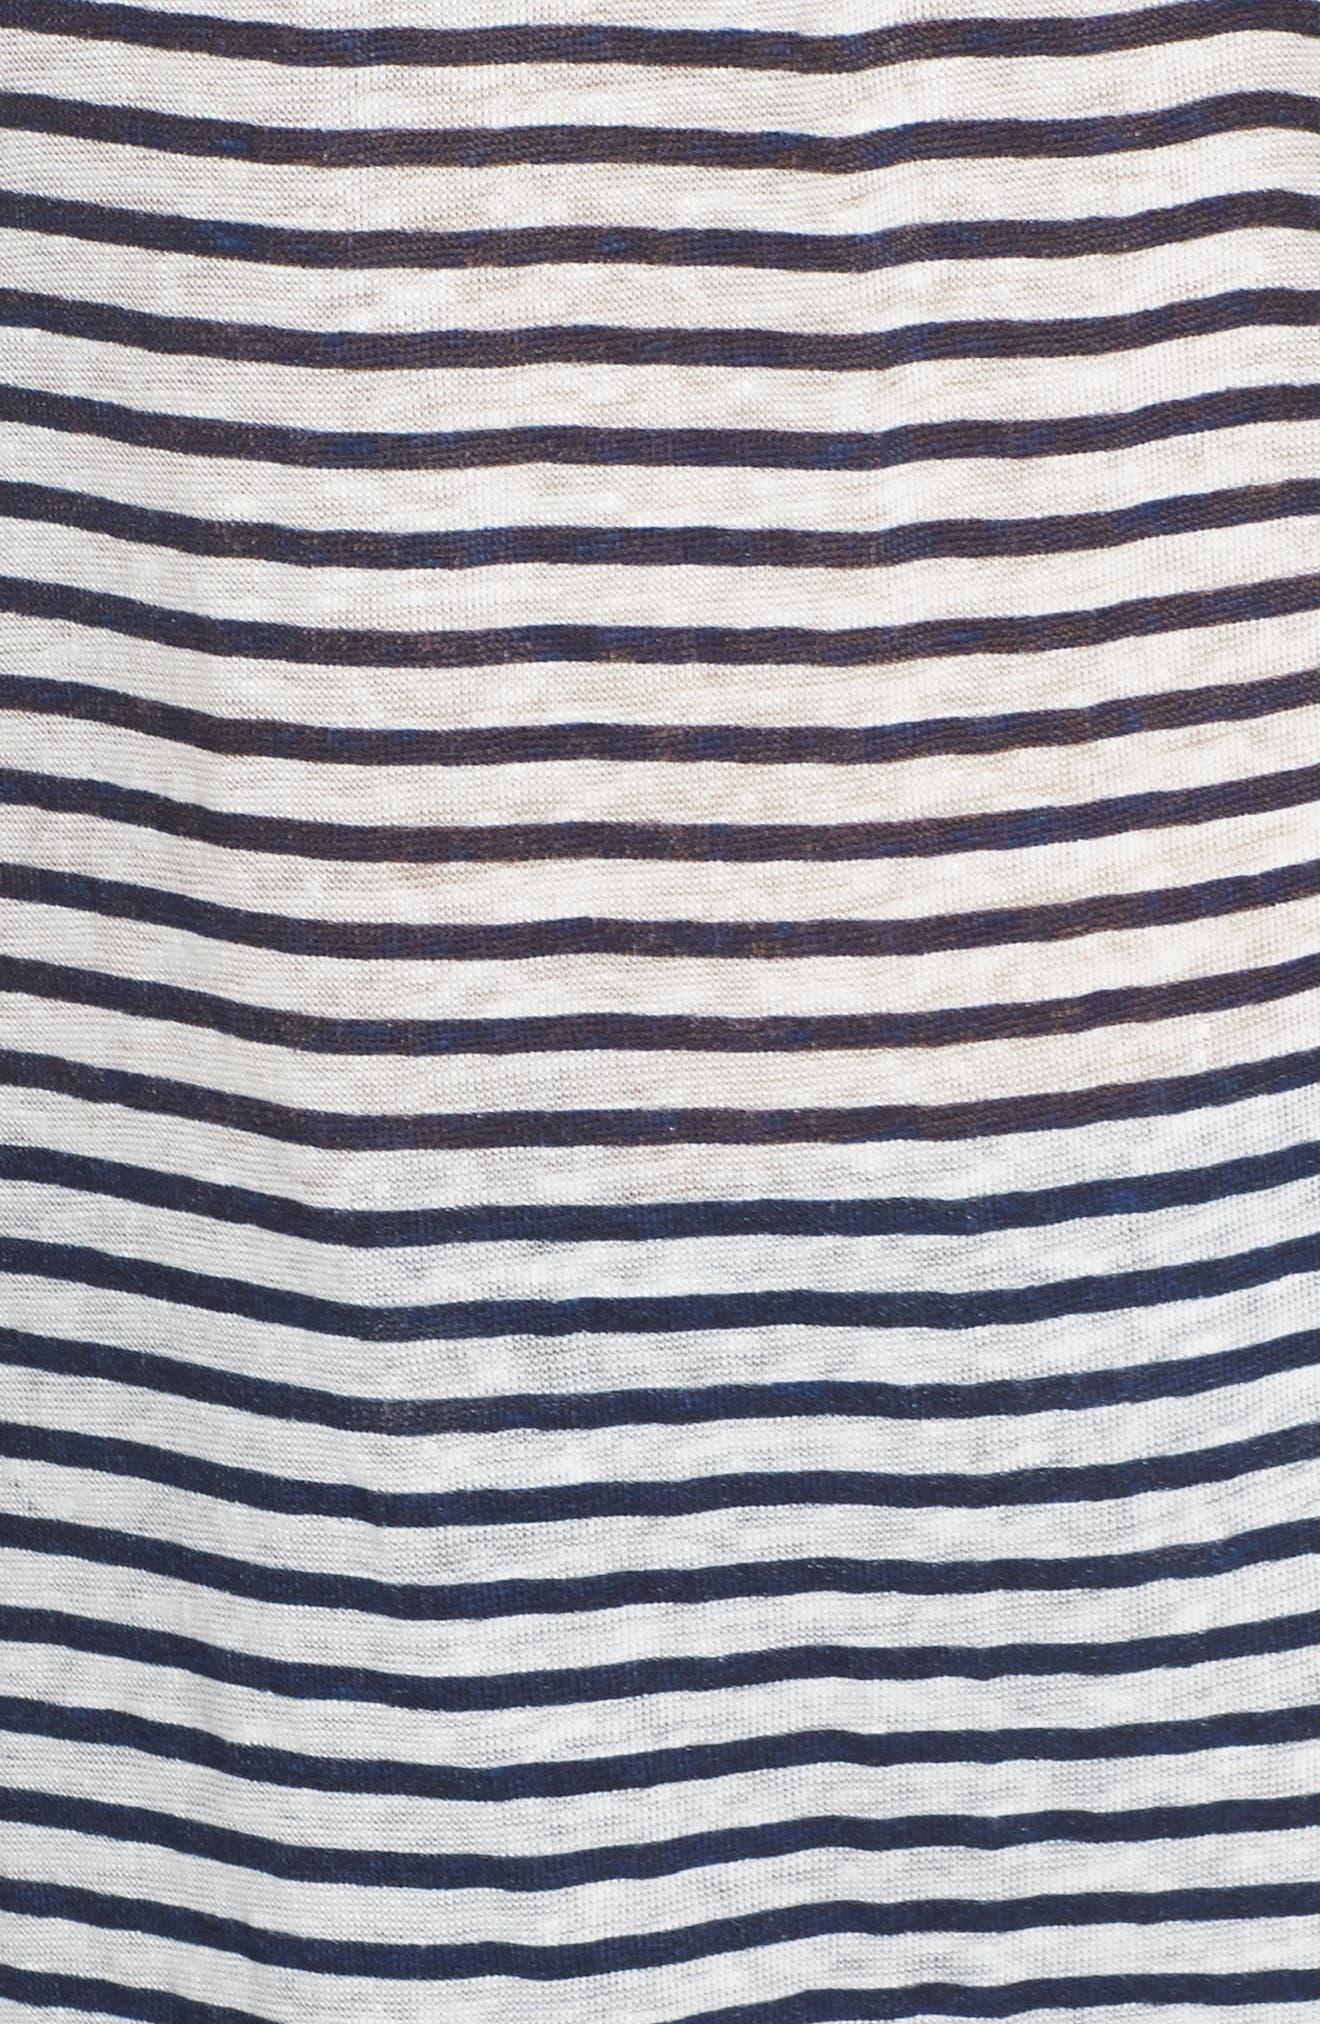 Off the Shoulder Paisley Stripe Top,                             Alternate thumbnail 5, color,